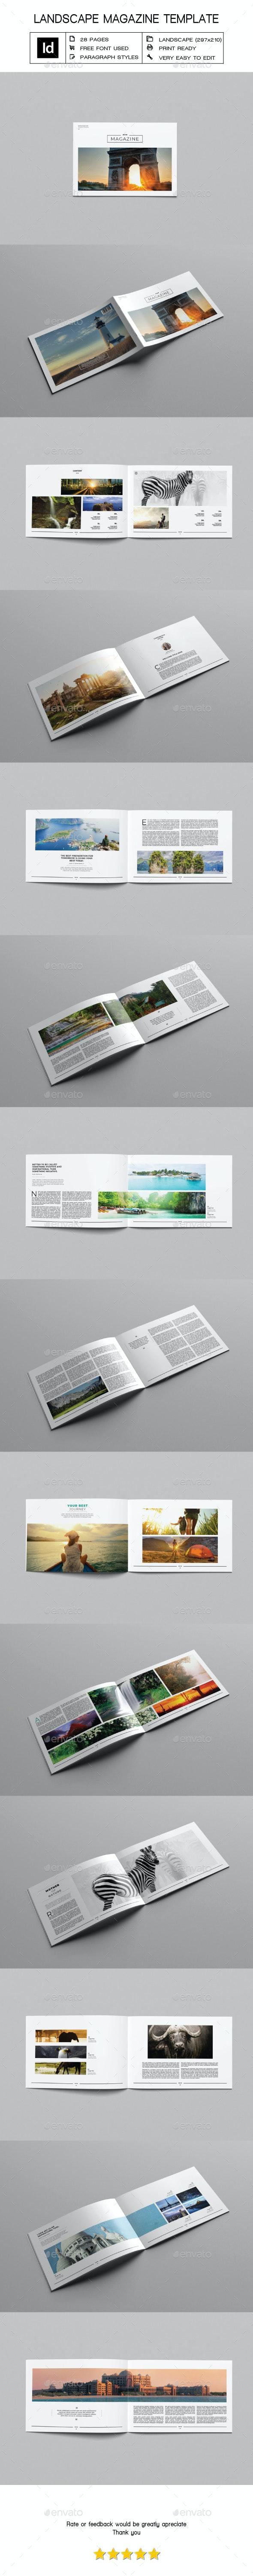 Minimal Landscape Magazine Template - Magazines Print Templates